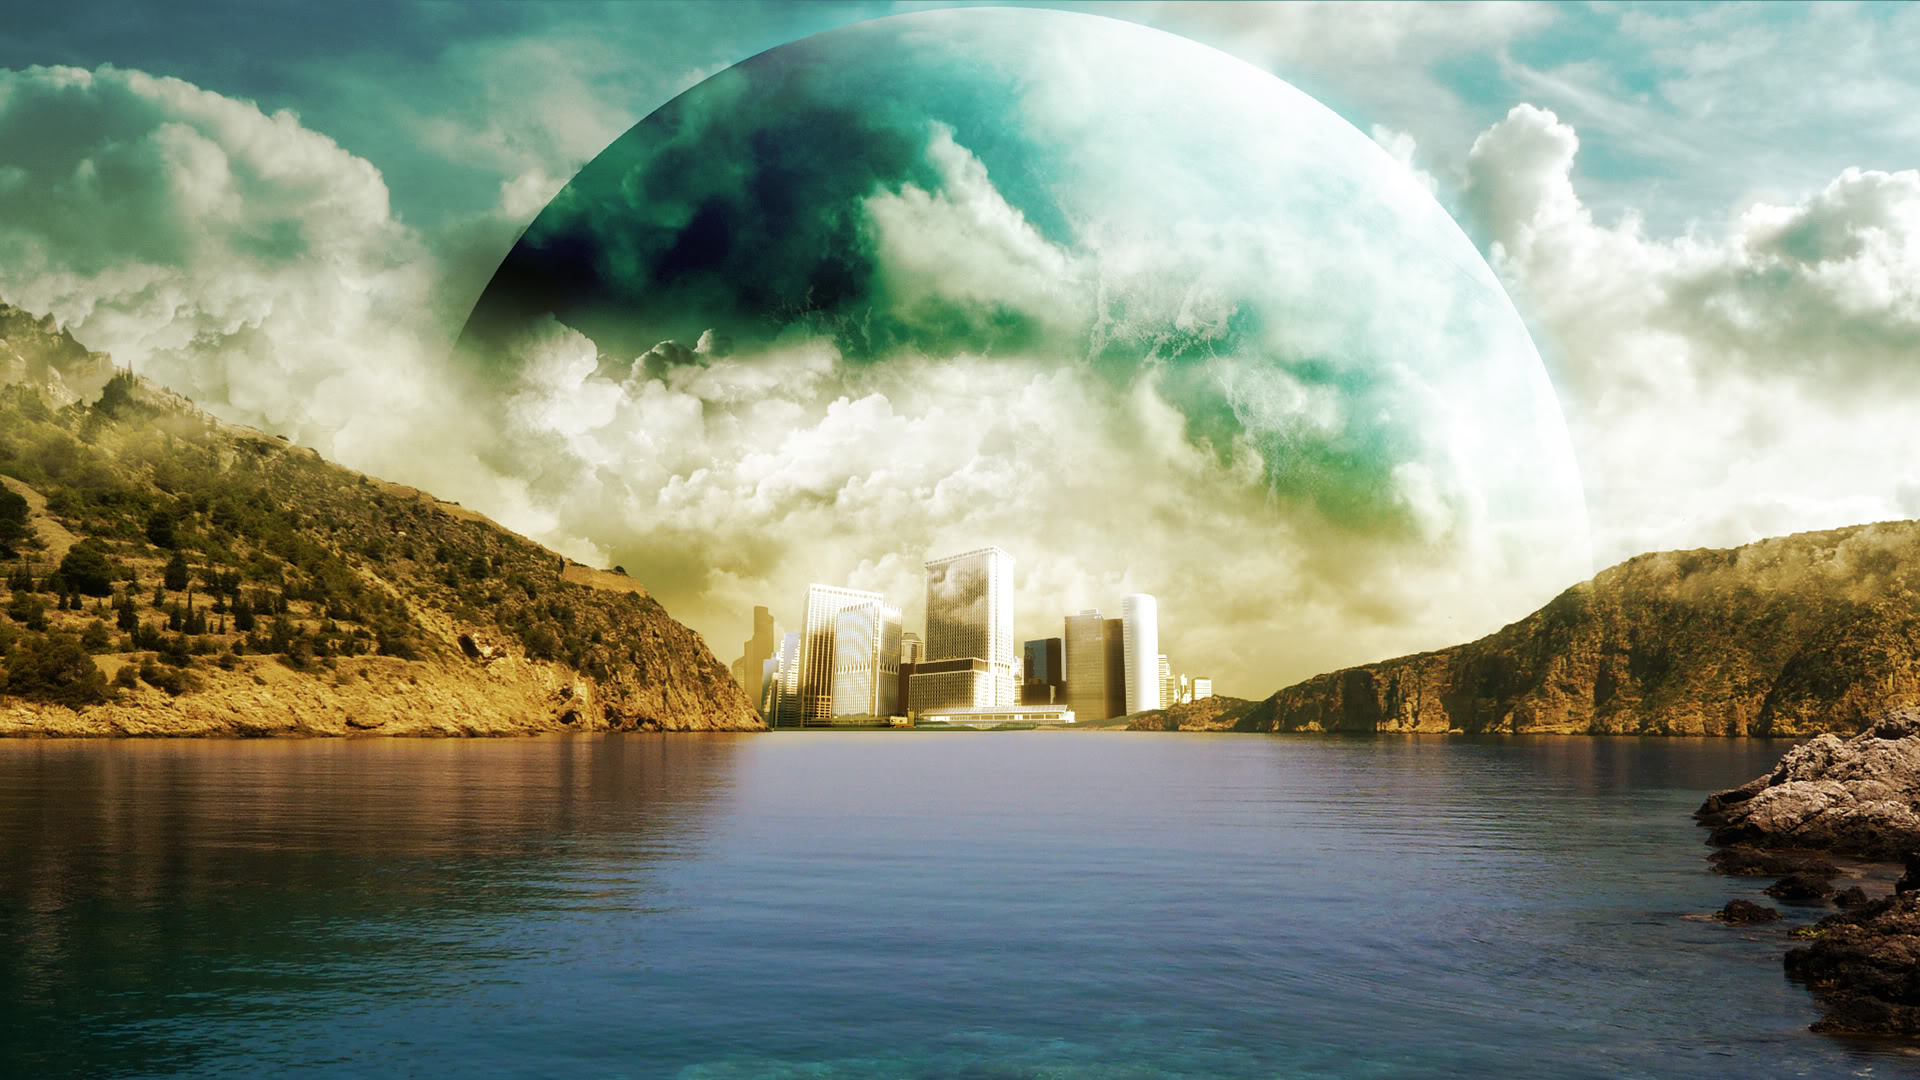 High Resolution Awesome Fantasy Sci Fi Landscape Wallpaper HD 1 ...